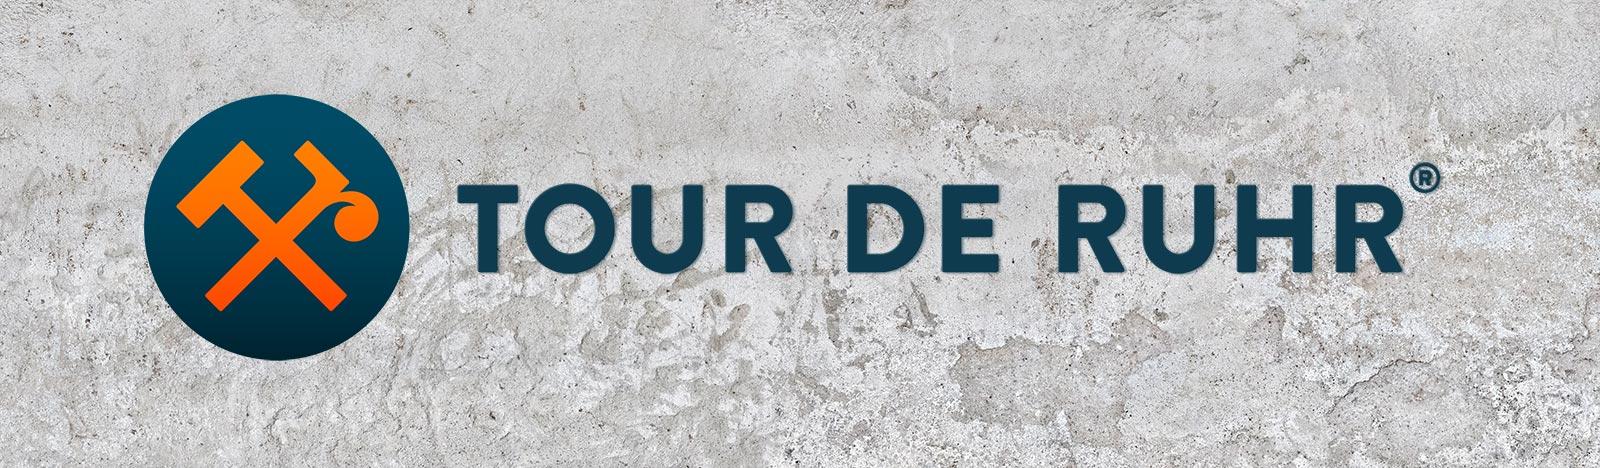 trommer tour de ruhr logo wall 2021